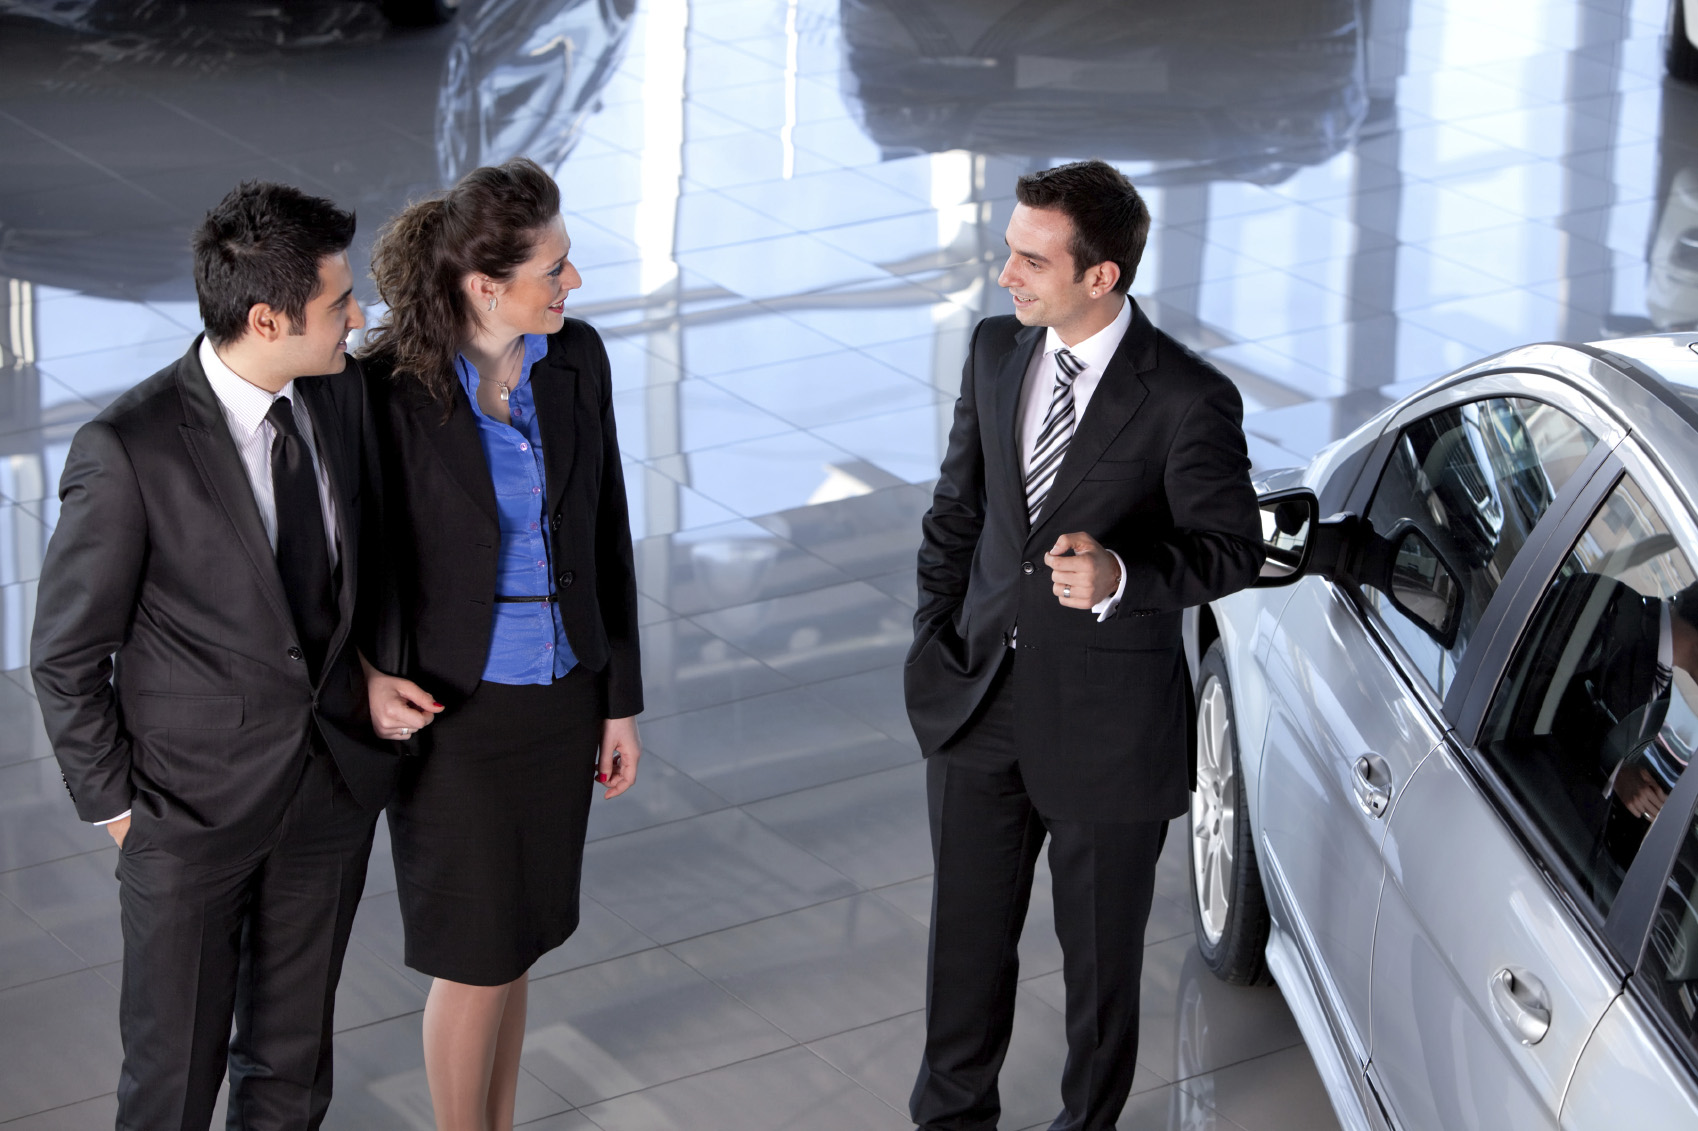 Chevrolet Dealer in Grand Ledge, MI